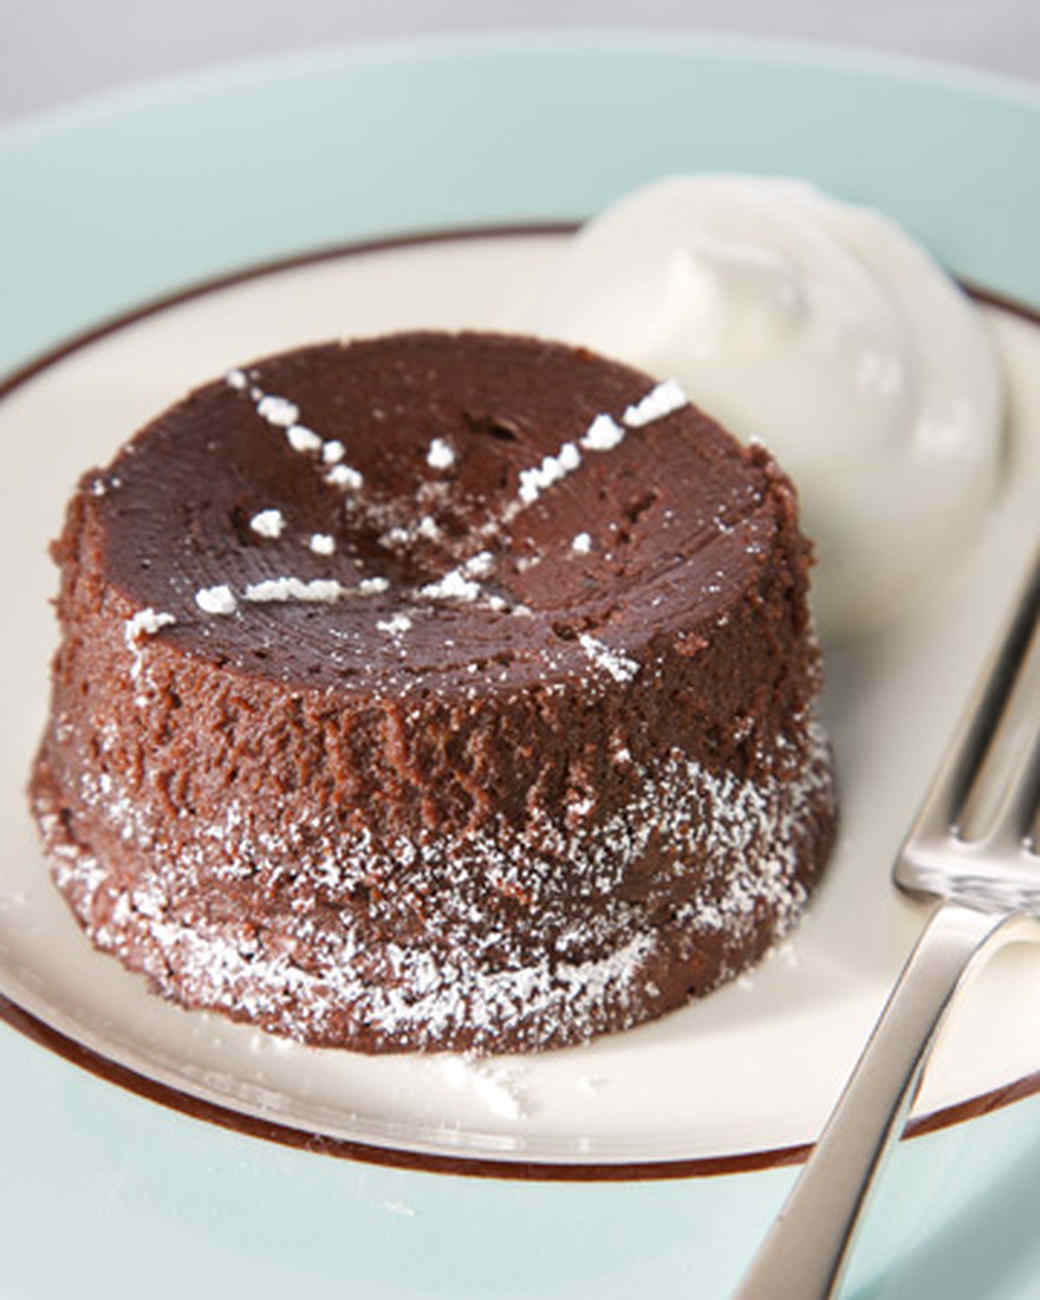 Martha Stewart Chocolate Peanut Butter Cheesecake